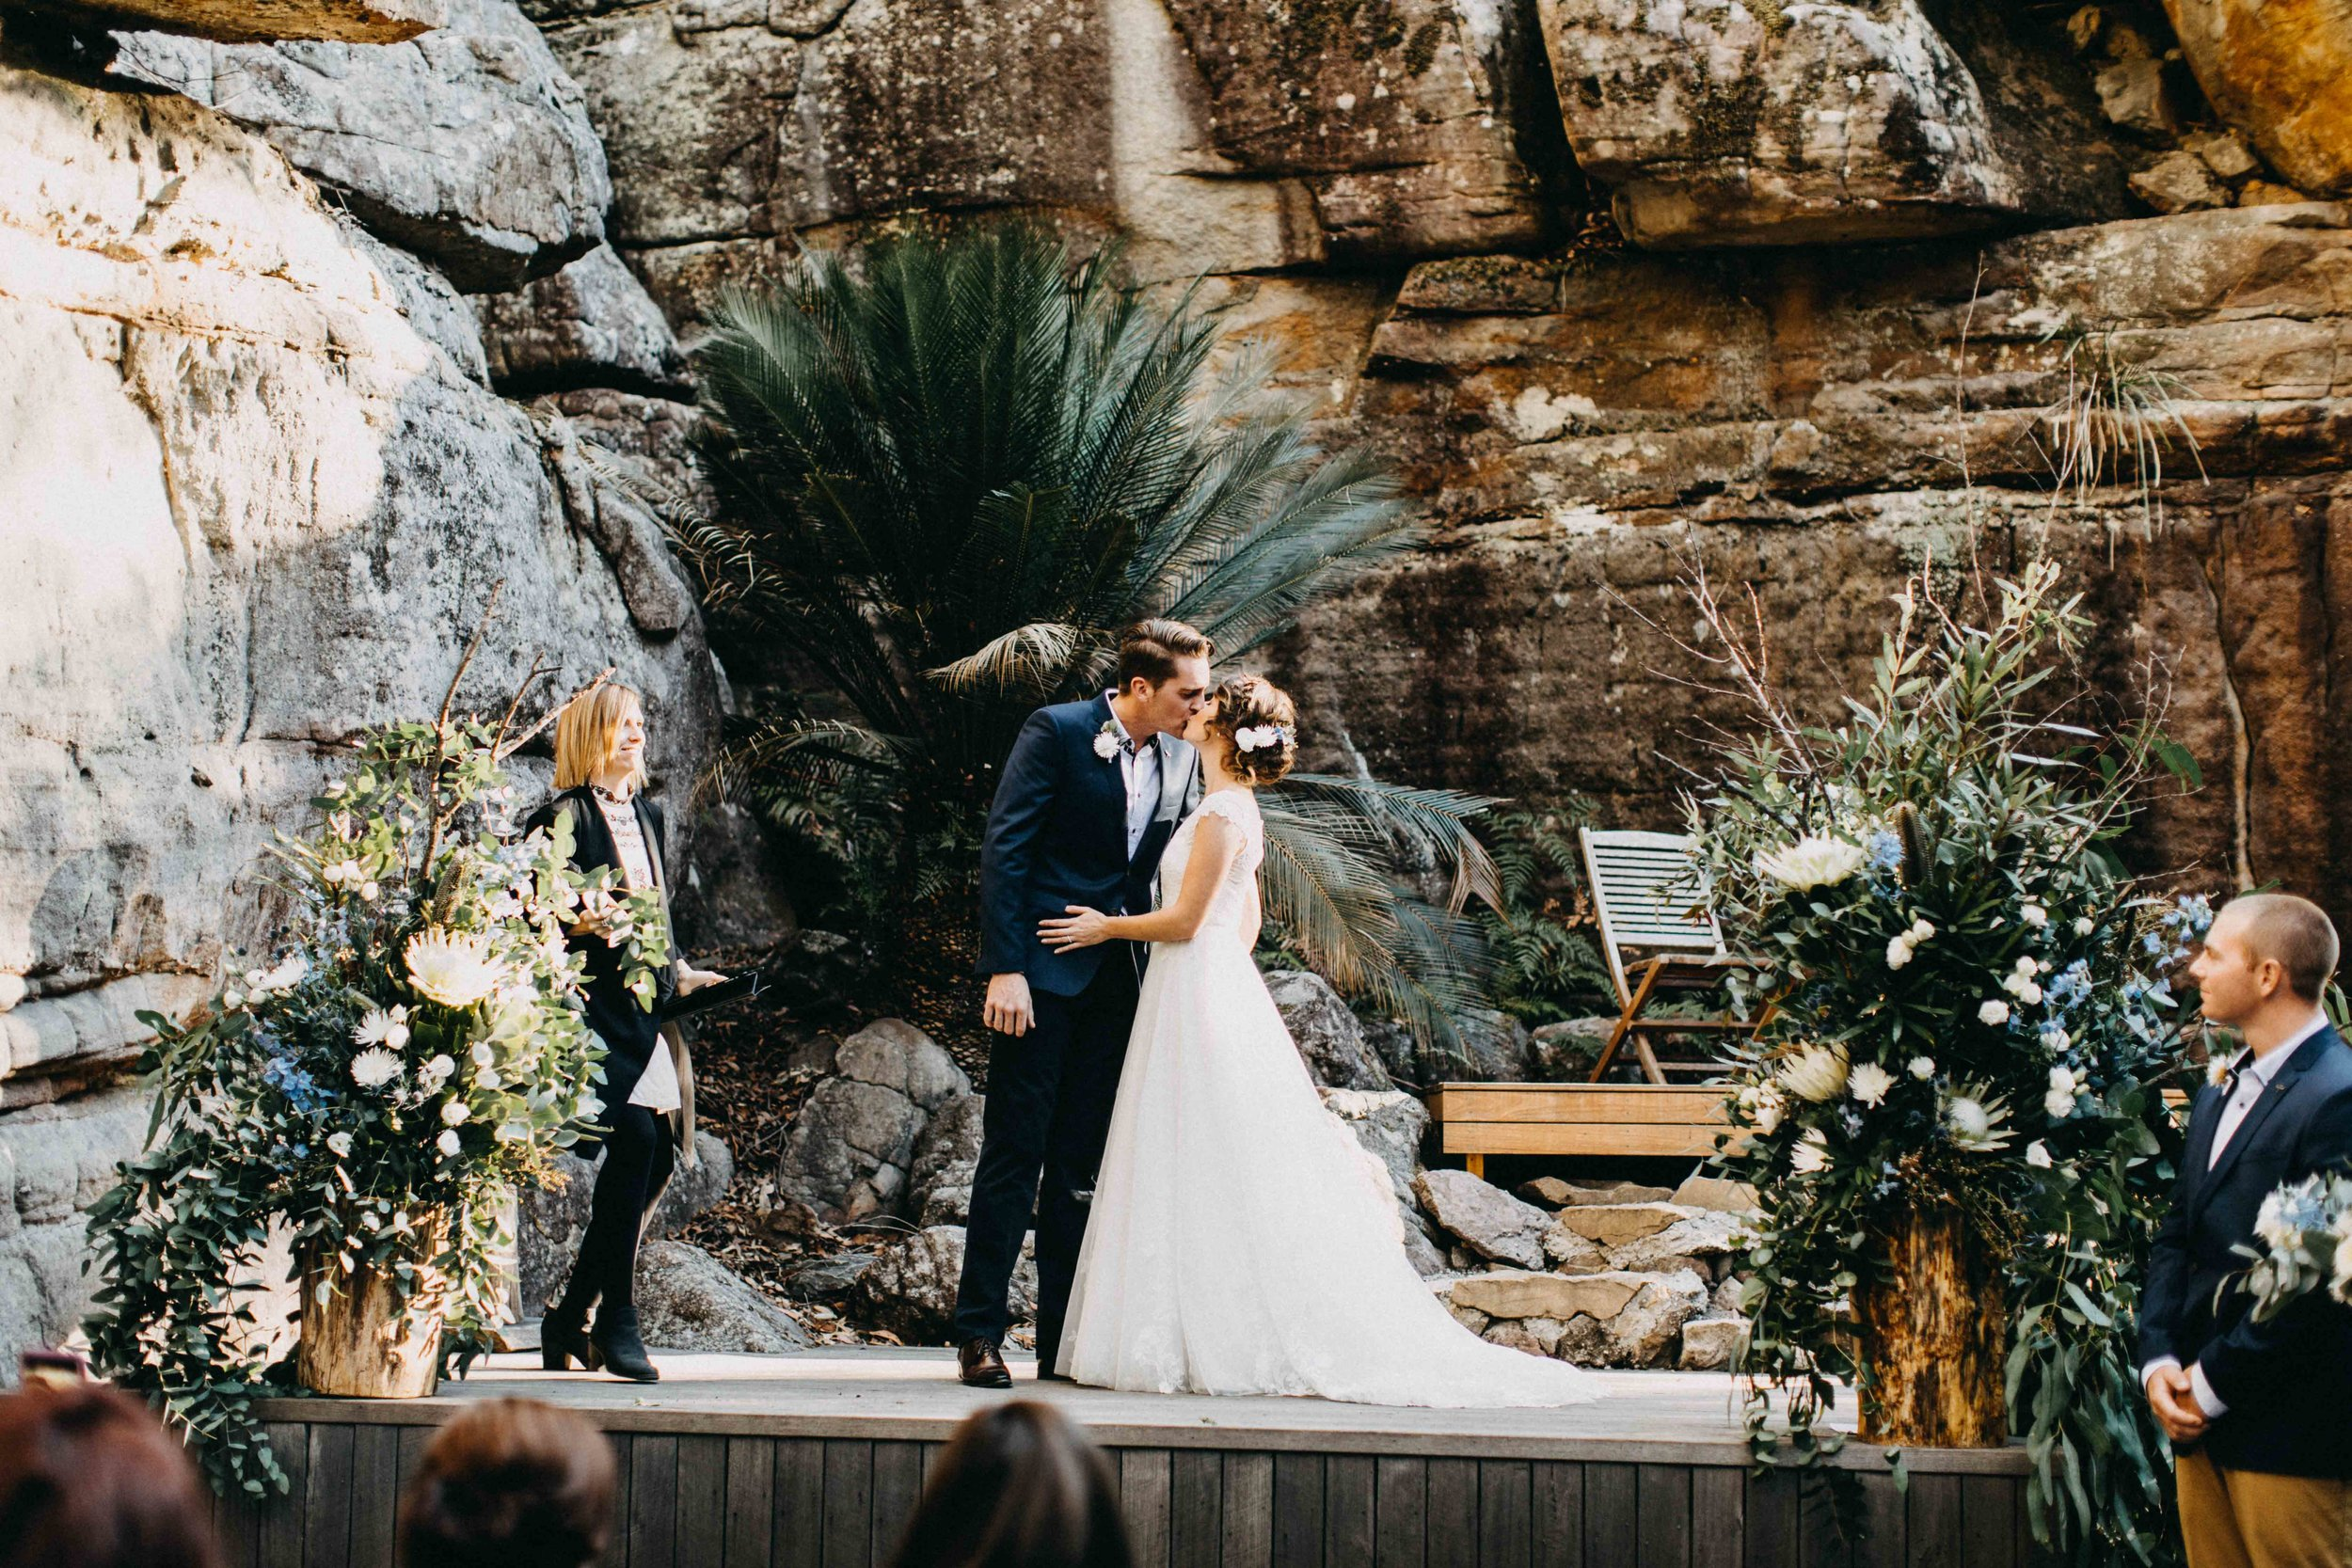 kangaroo-valley-bush-retreat-wedding-lydia-nate-www.emilyobrienphotography.net-64.jpg